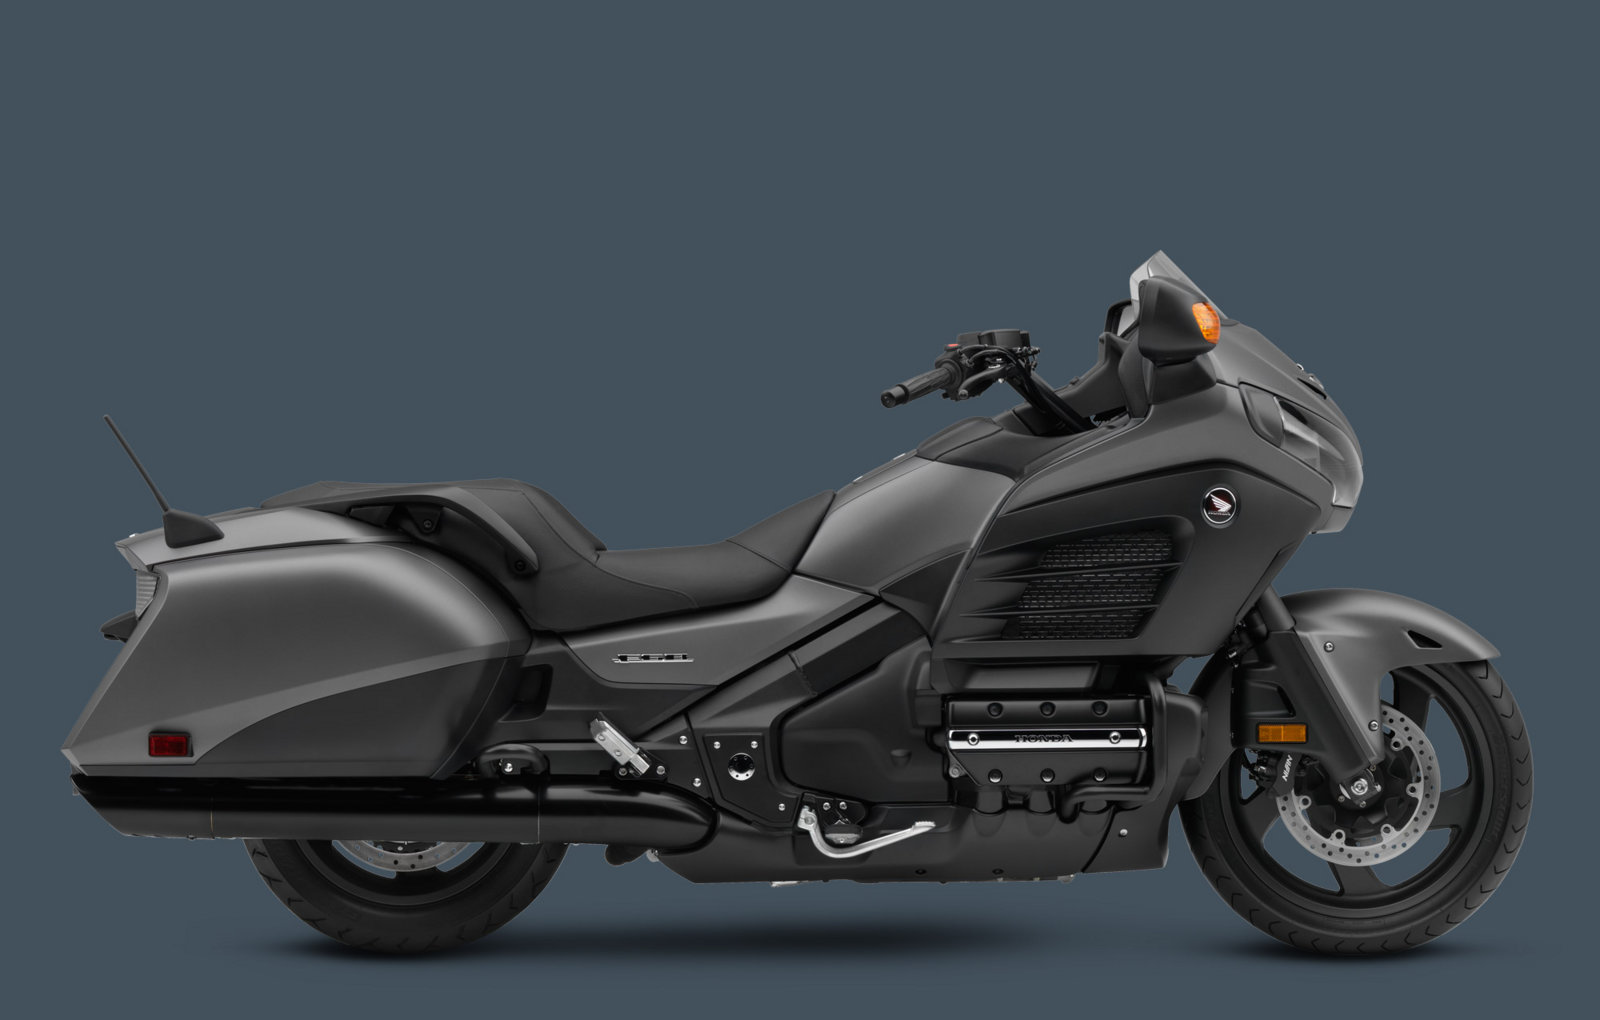 BMW Bagger coming soon - K 1600 B | South Bay Riders